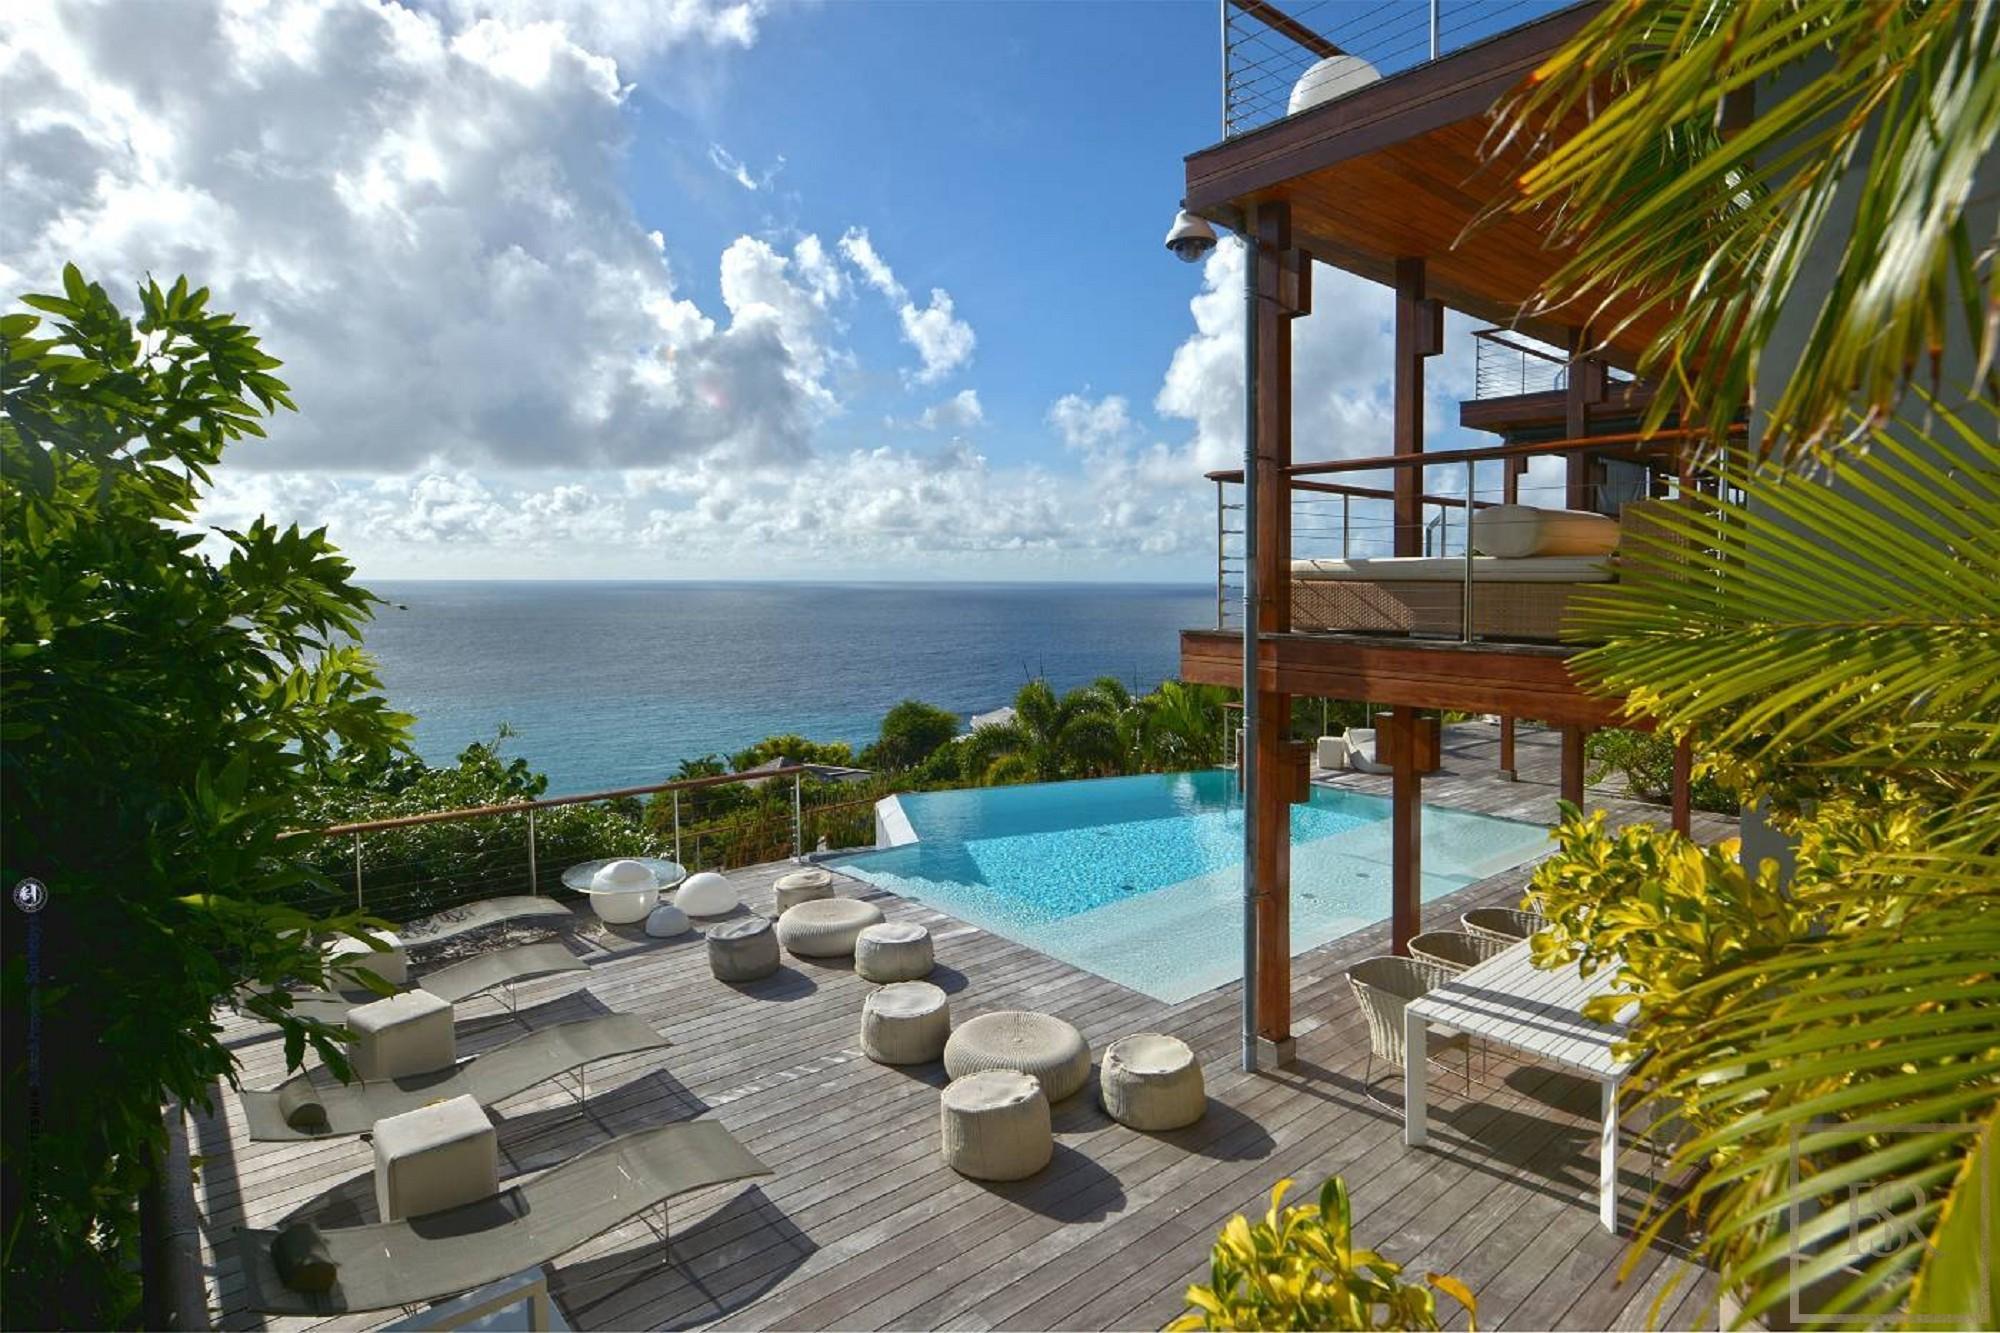 Villa Lyra 6 BR - Gouverneur, St Barth / St Barts rental For Super Rich